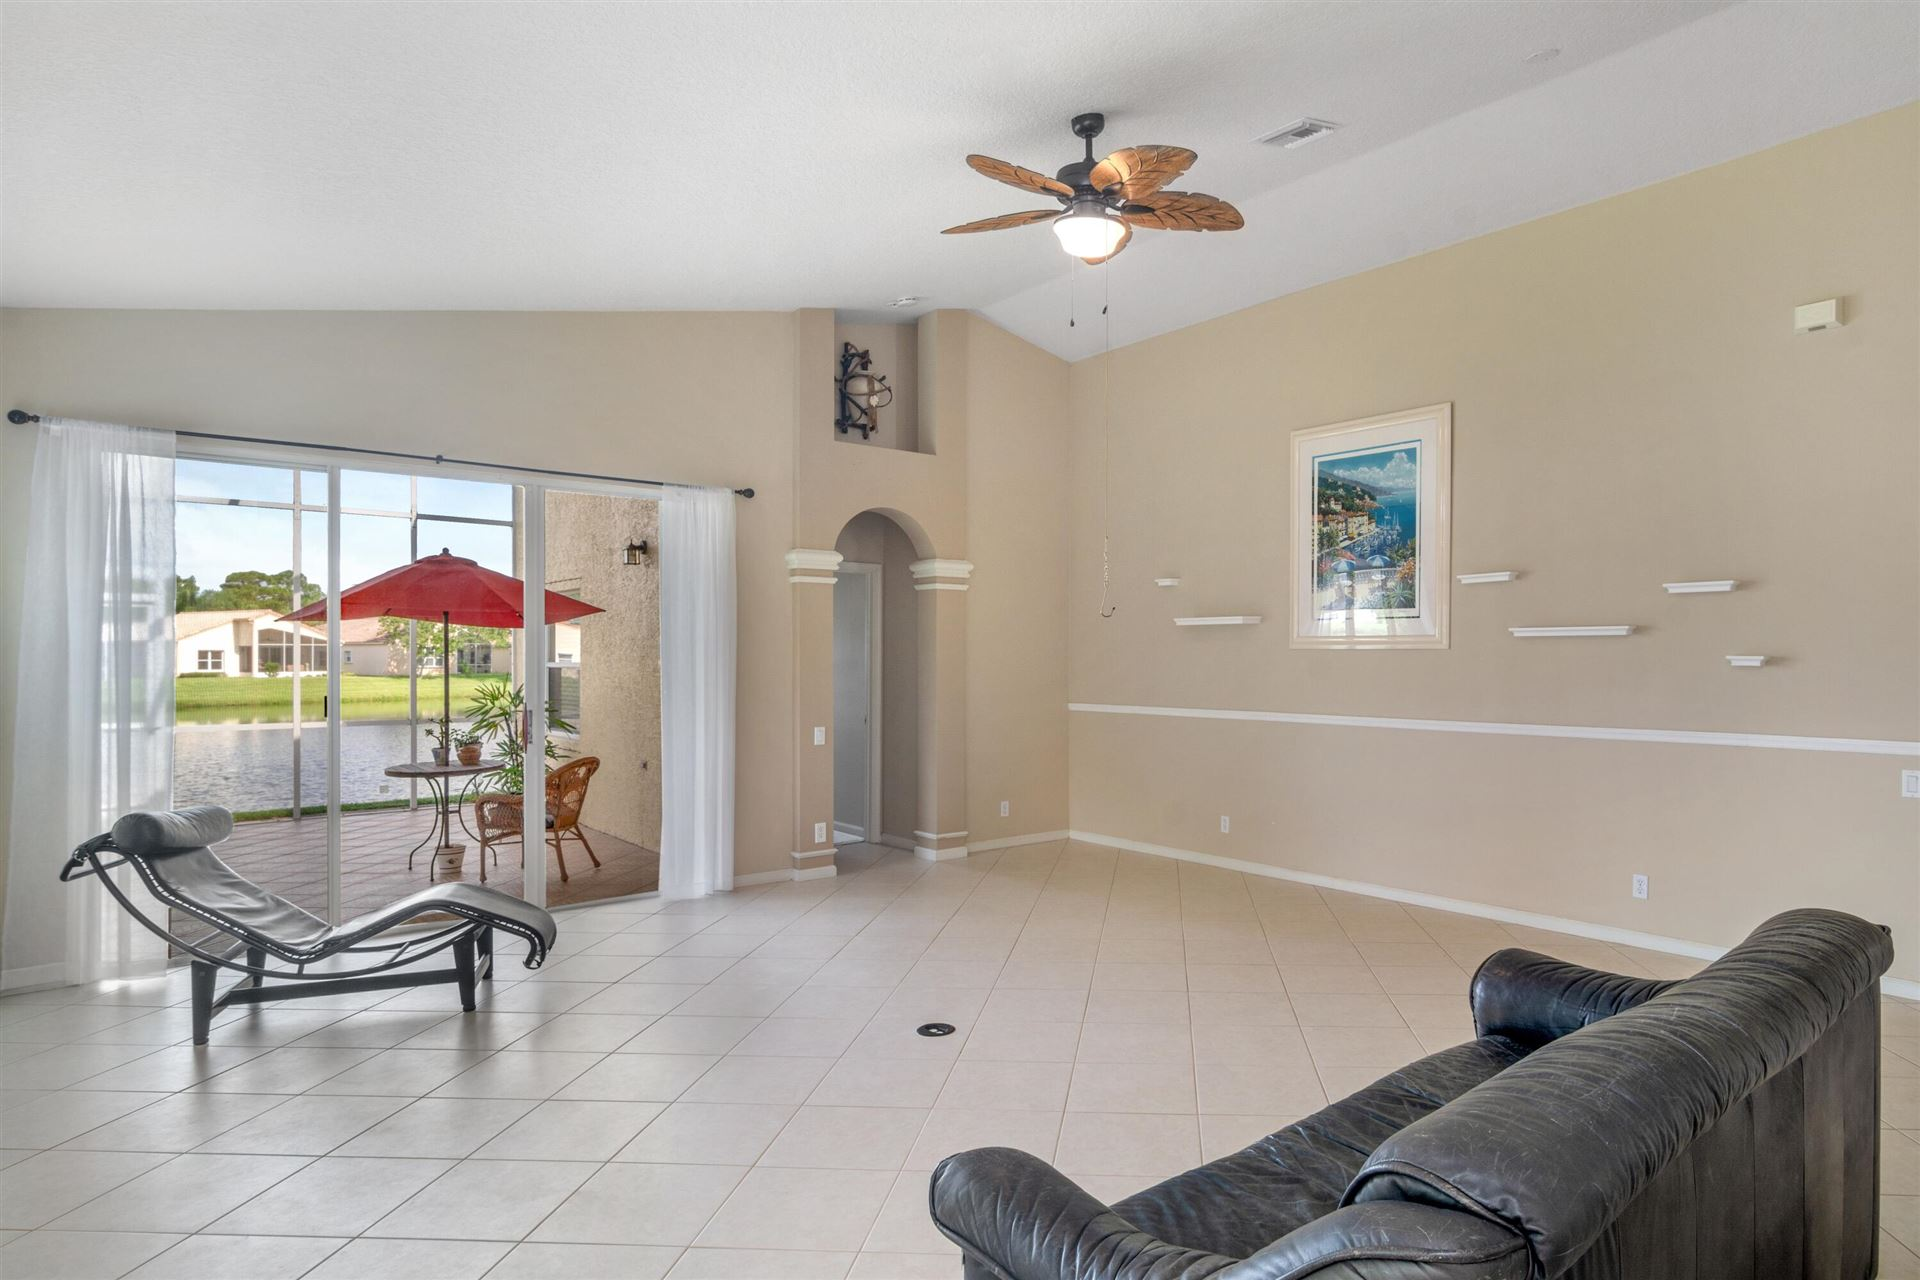 Photo of 468 NW Lismore Lane, Port Saint Lucie, FL 34986 (MLS # RX-10751046)